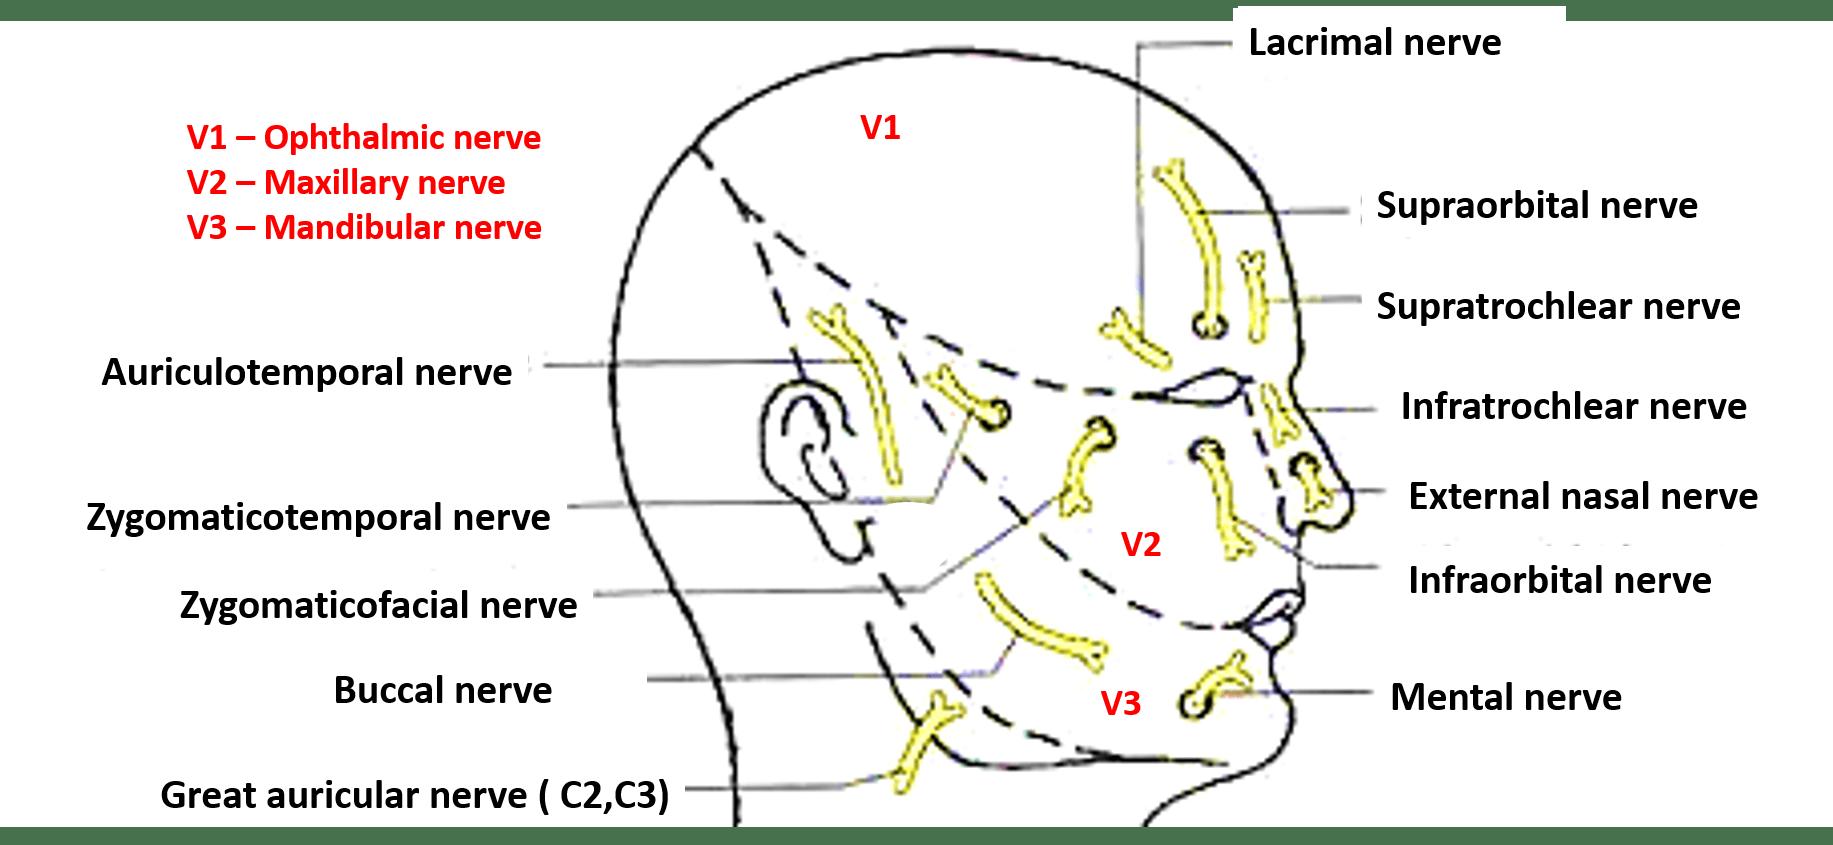 Face Nerve Supply